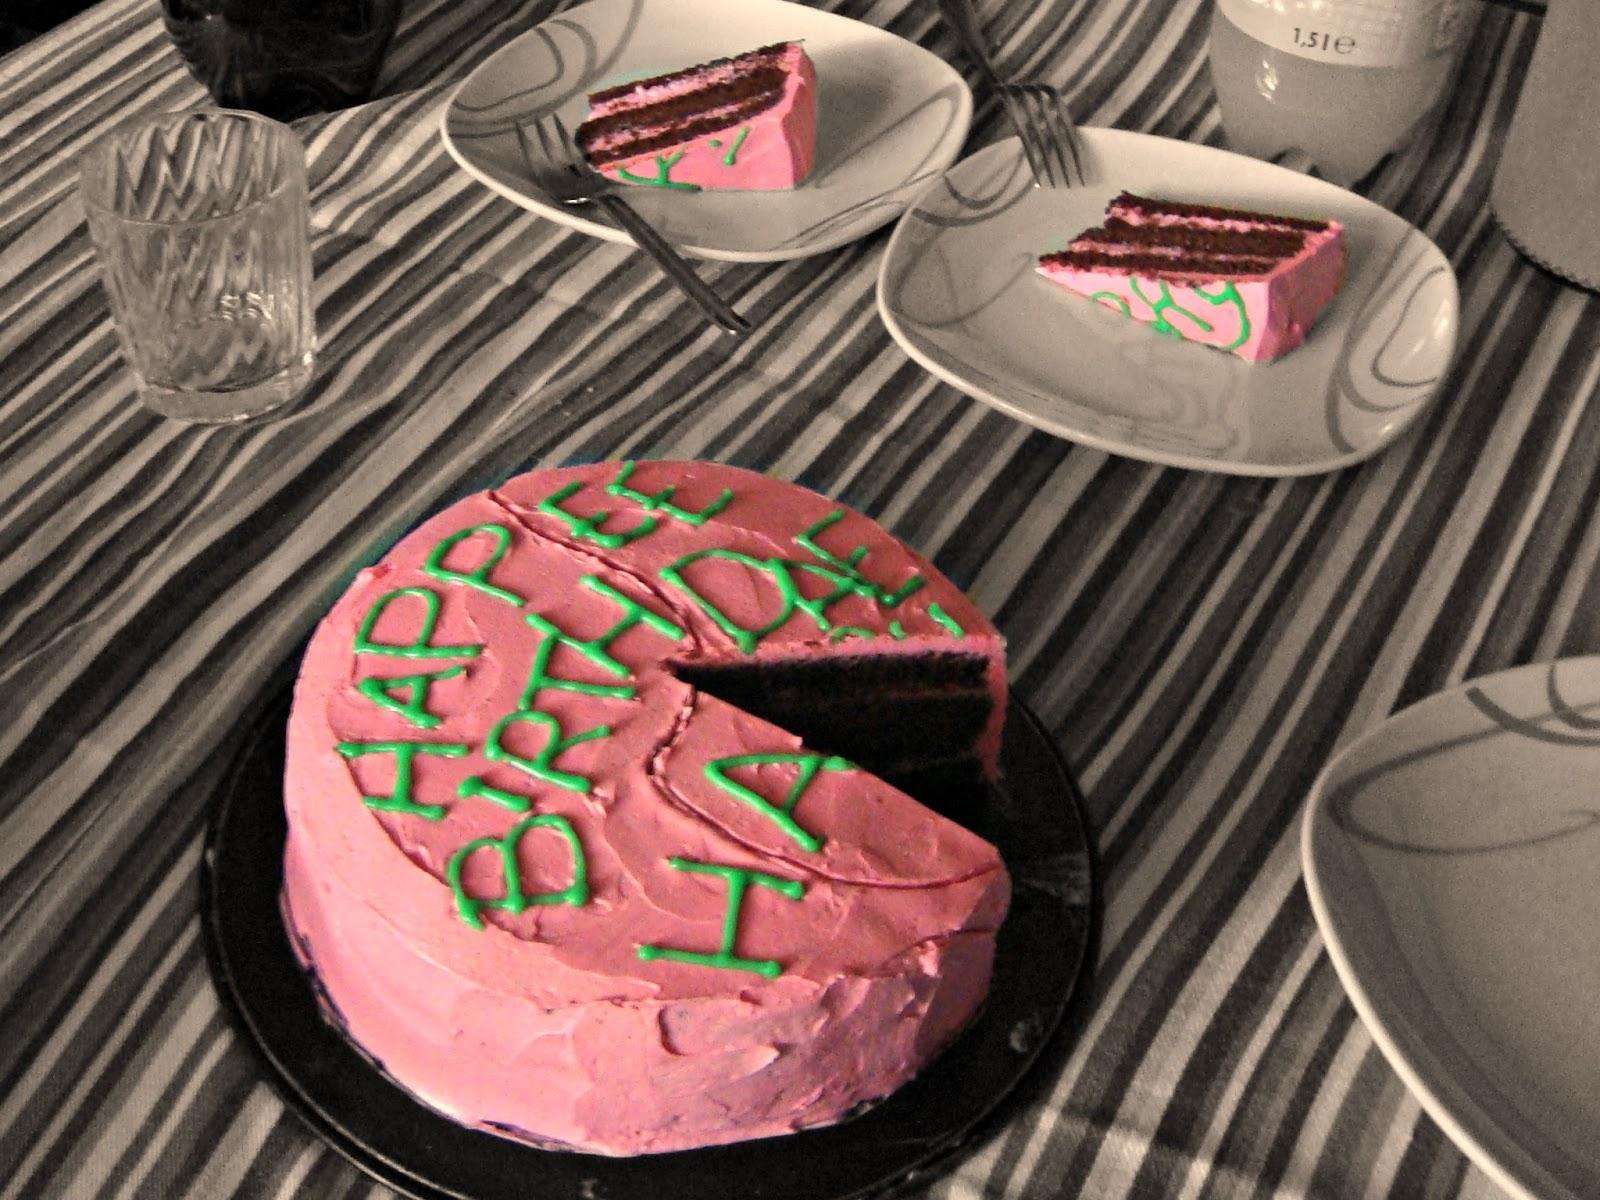 harry potter hagrid cake harry potter s chocolate cake from hagrid